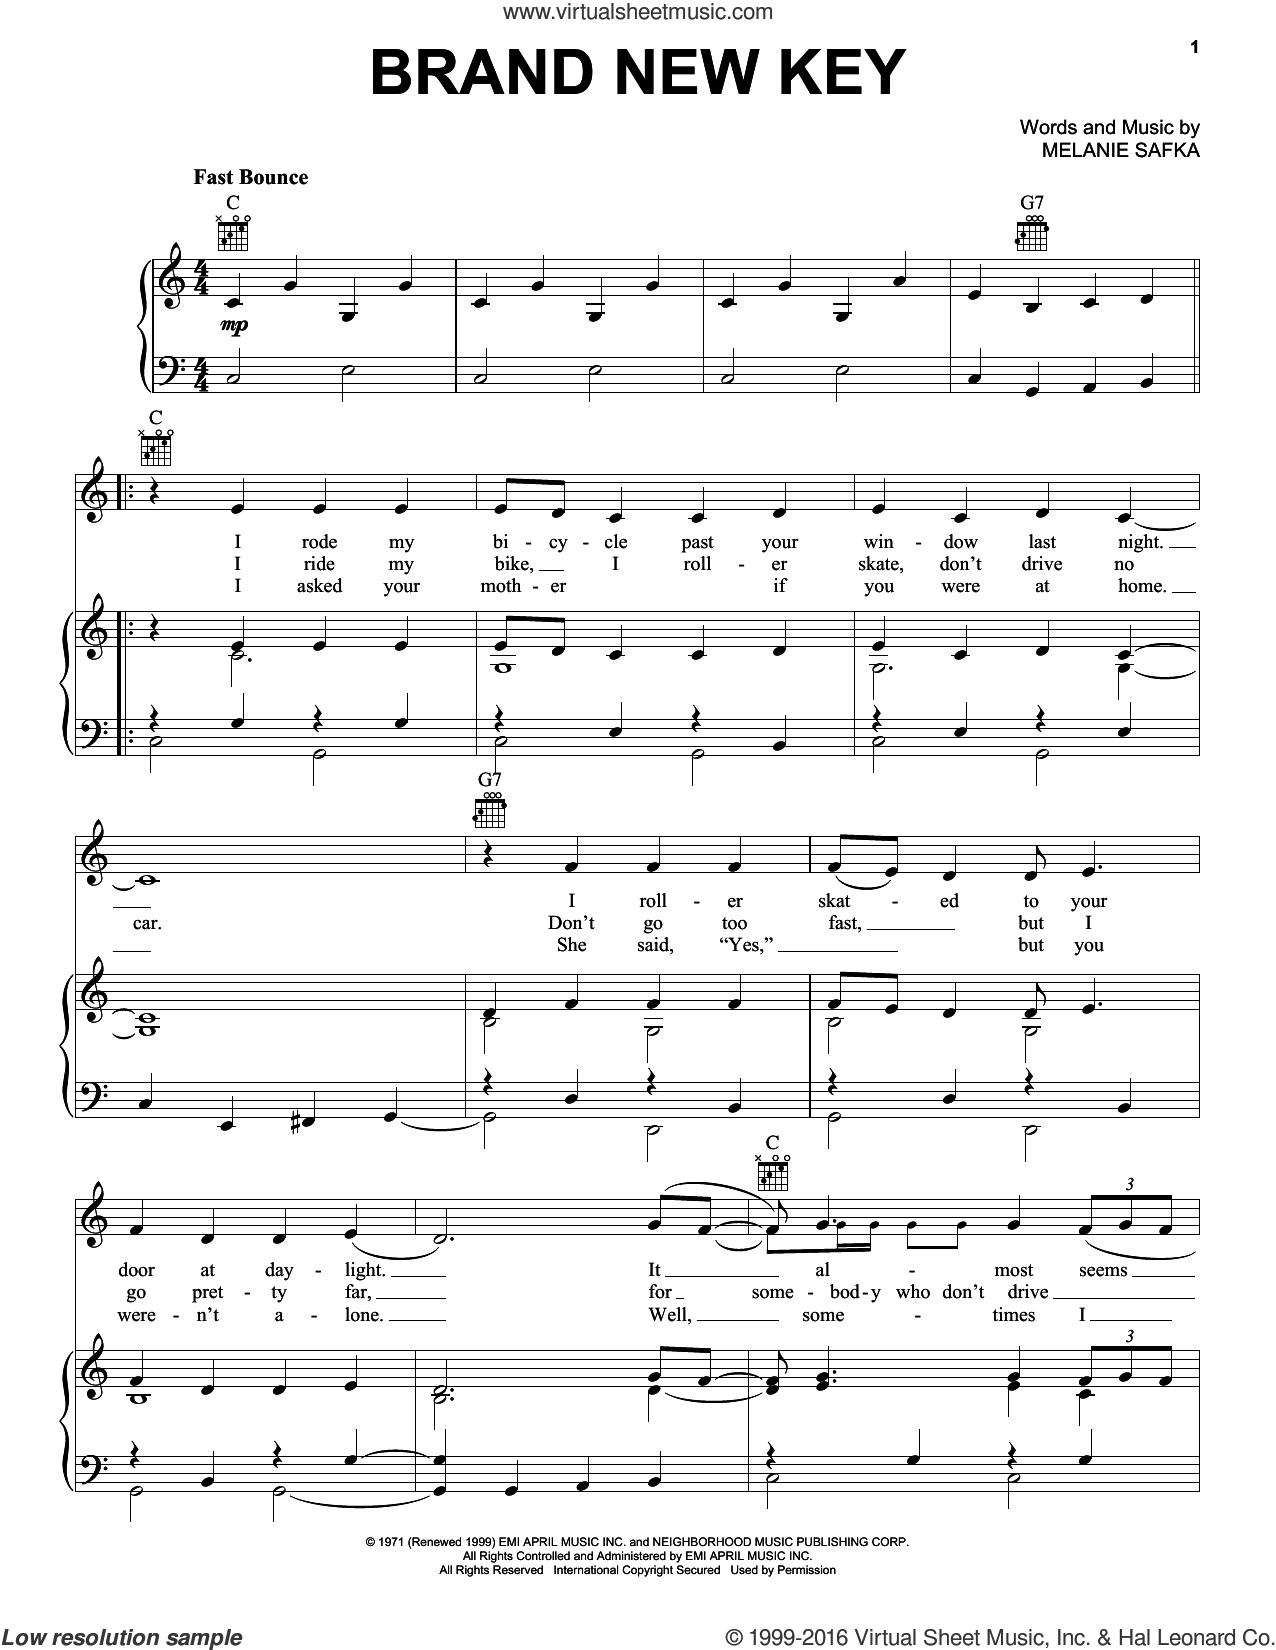 Brand New Key sheet music for voice, piano or guitar by Melanie and Melanie Safka, intermediate skill level